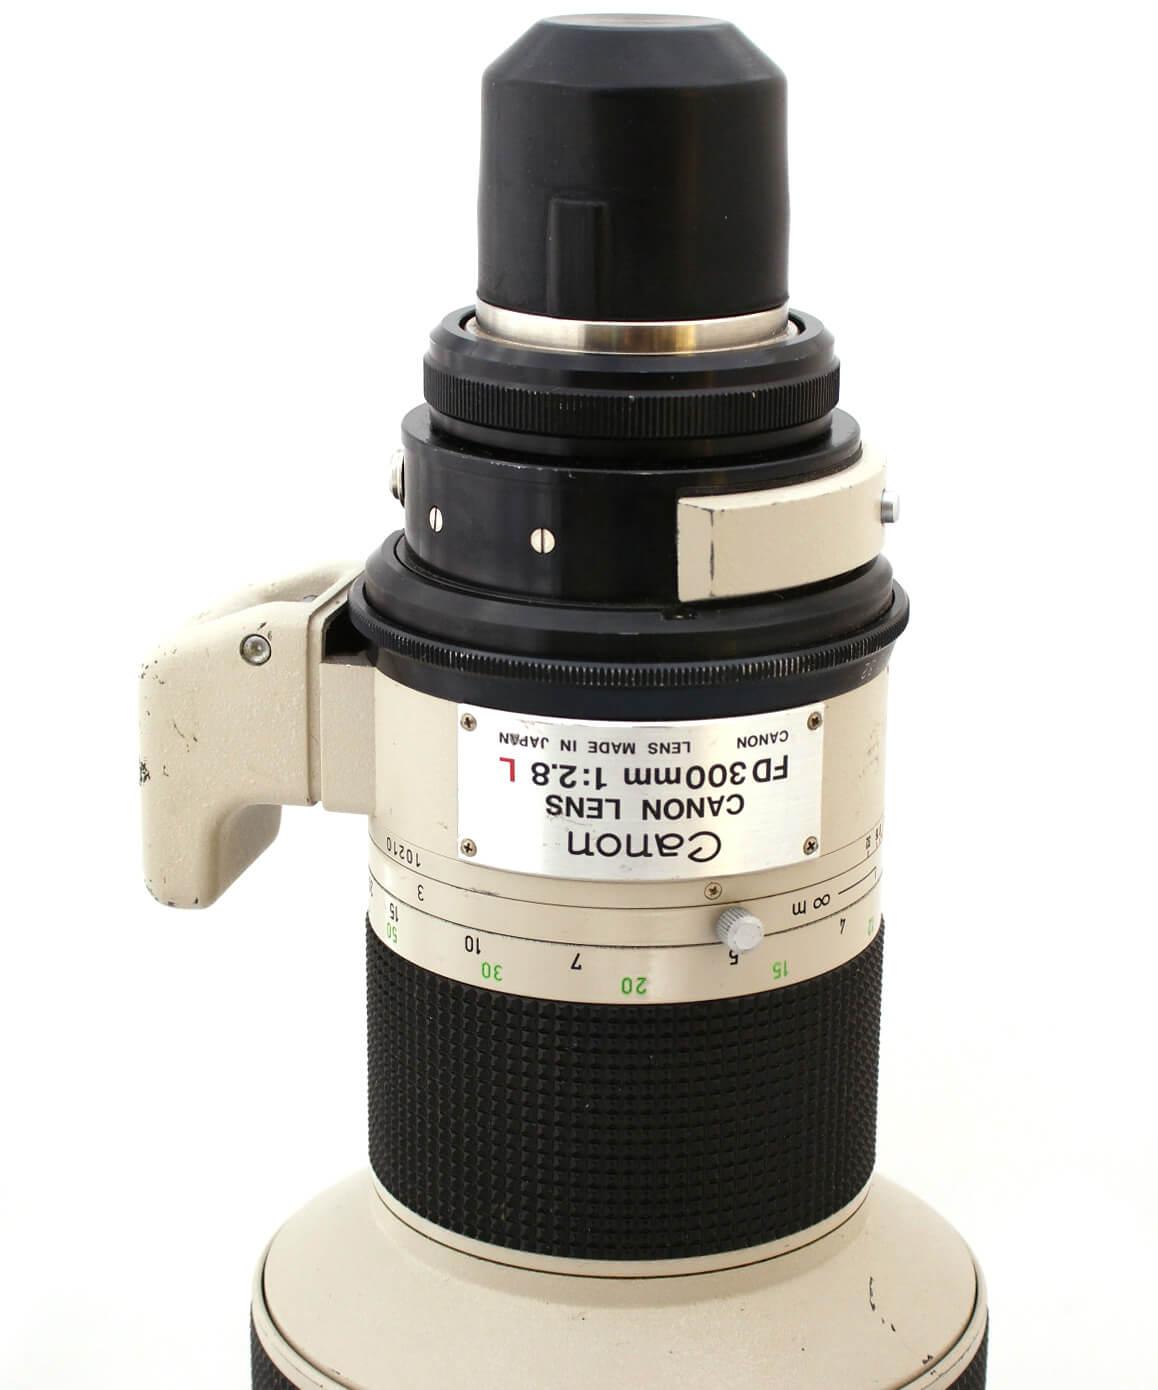 rental lenses canon 300 - camaleon rental